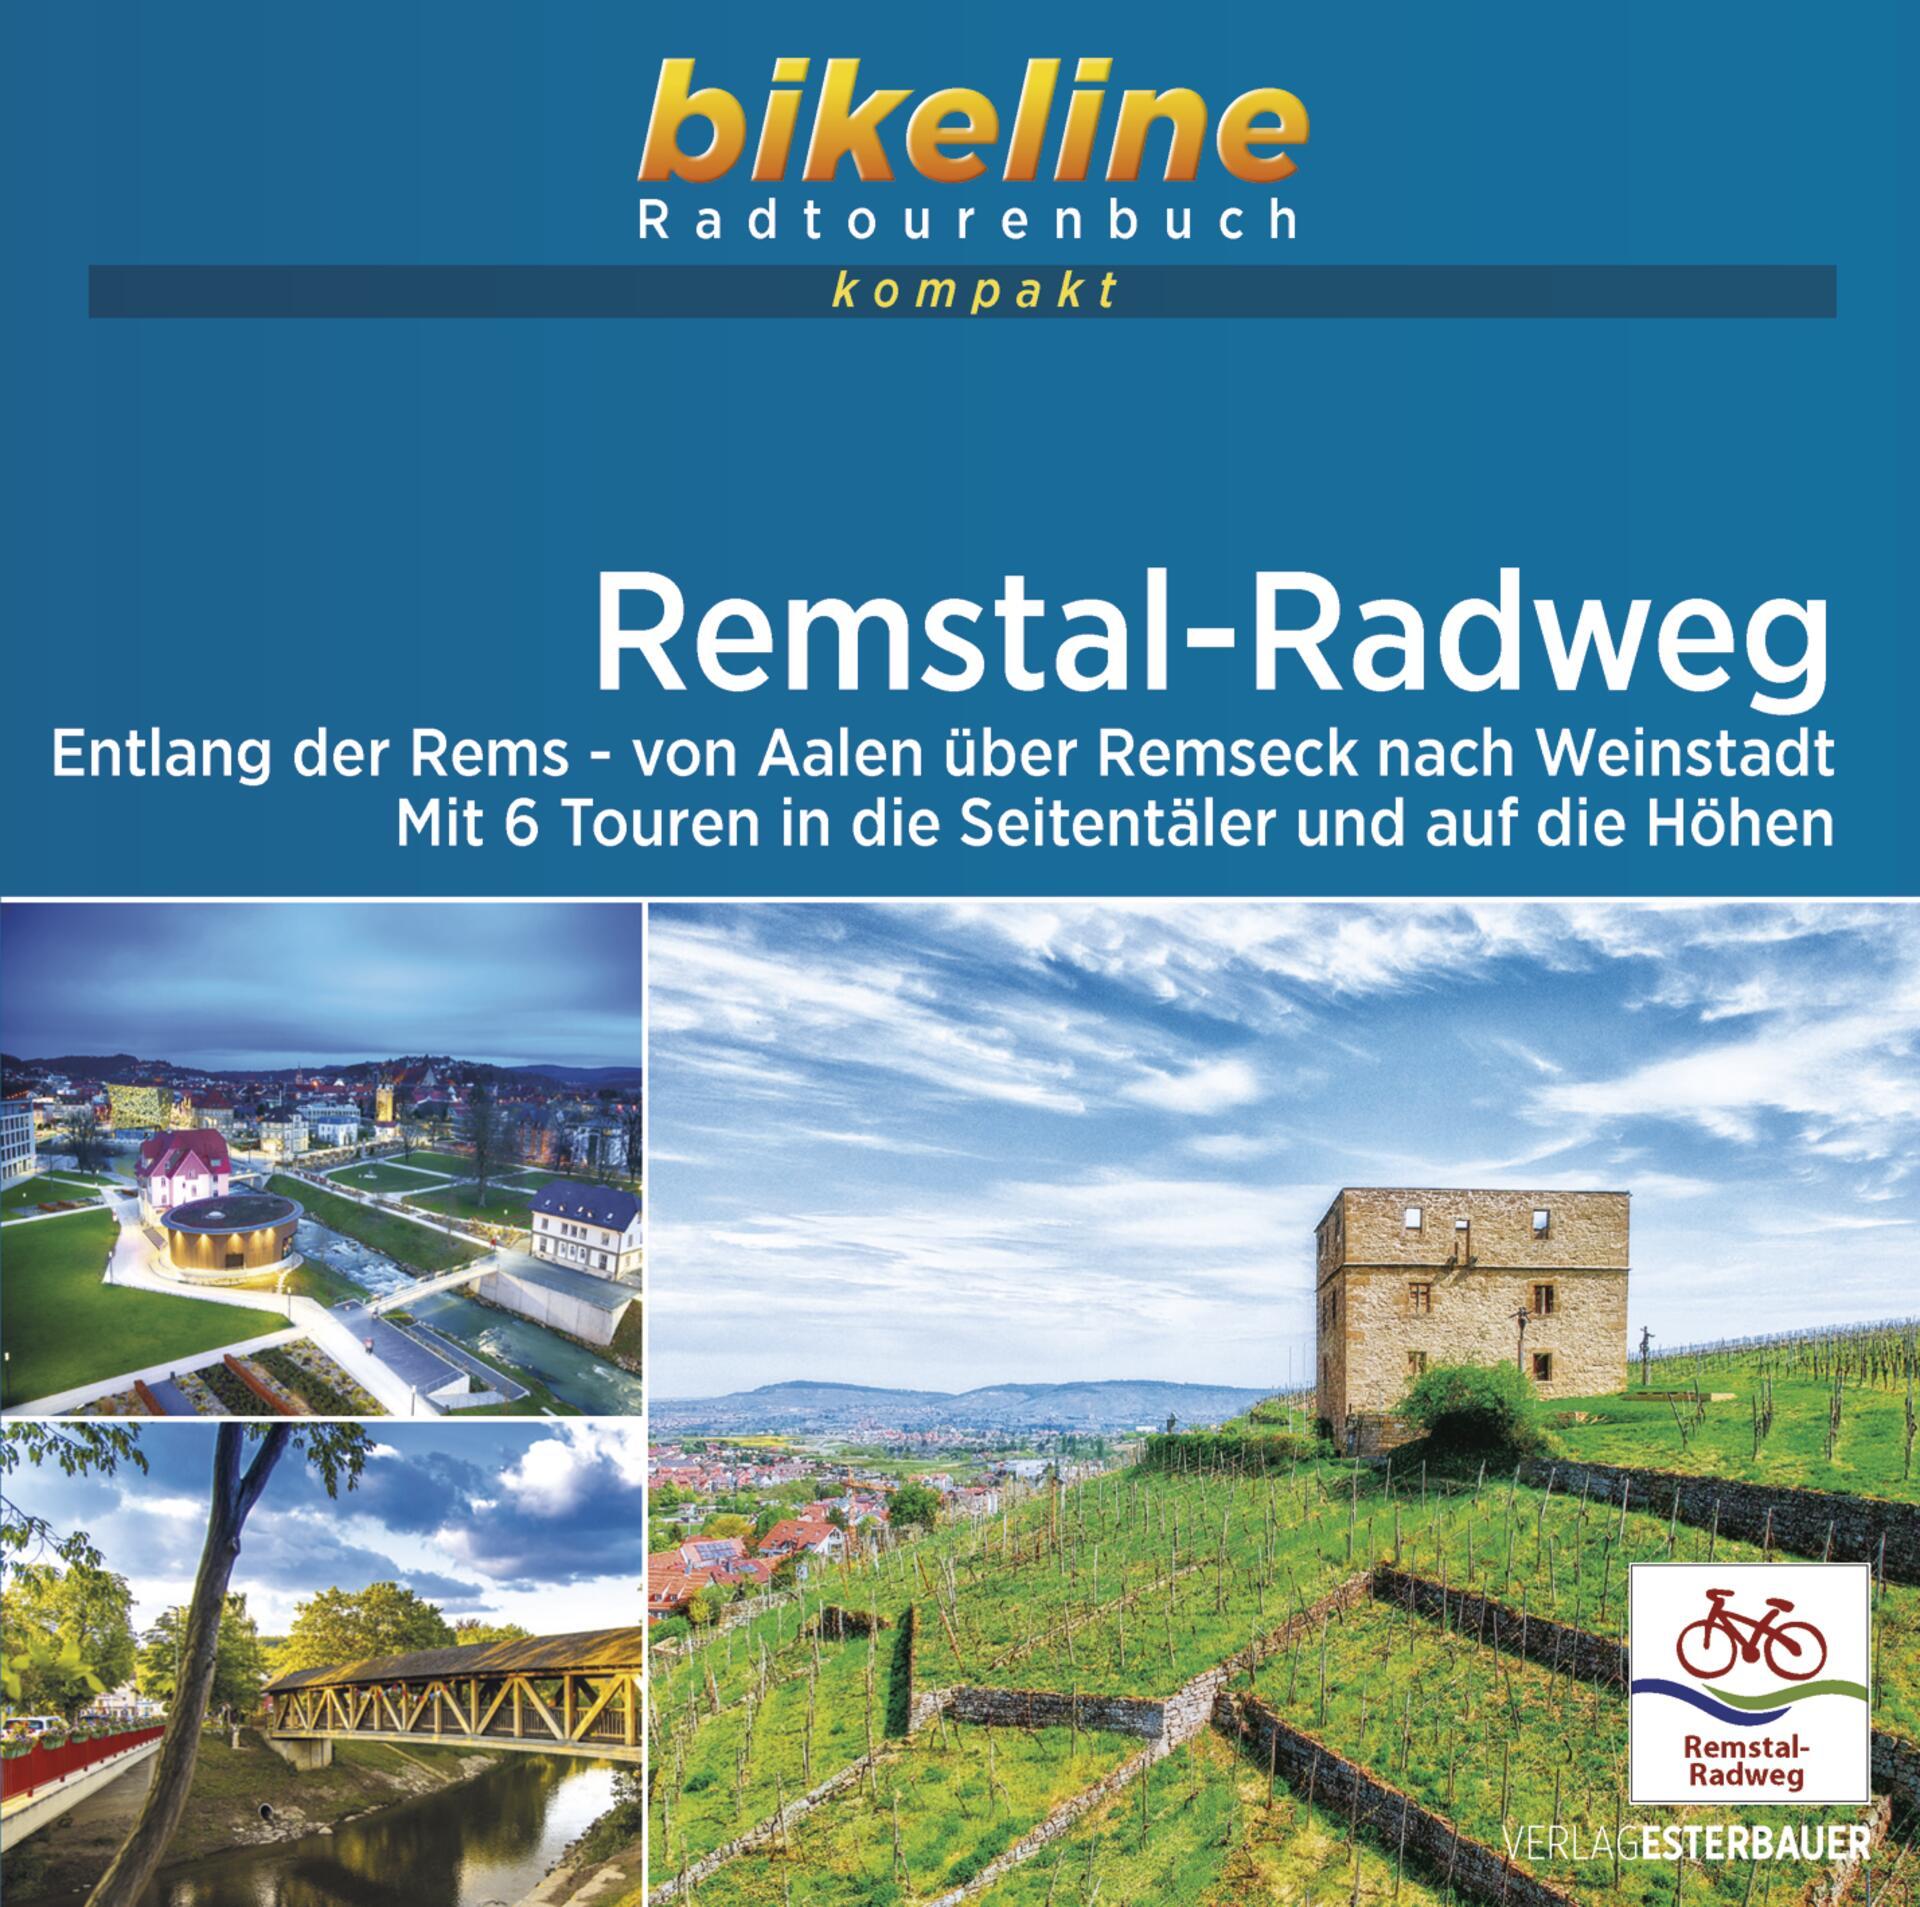 Foto vom Remstal-Radweg